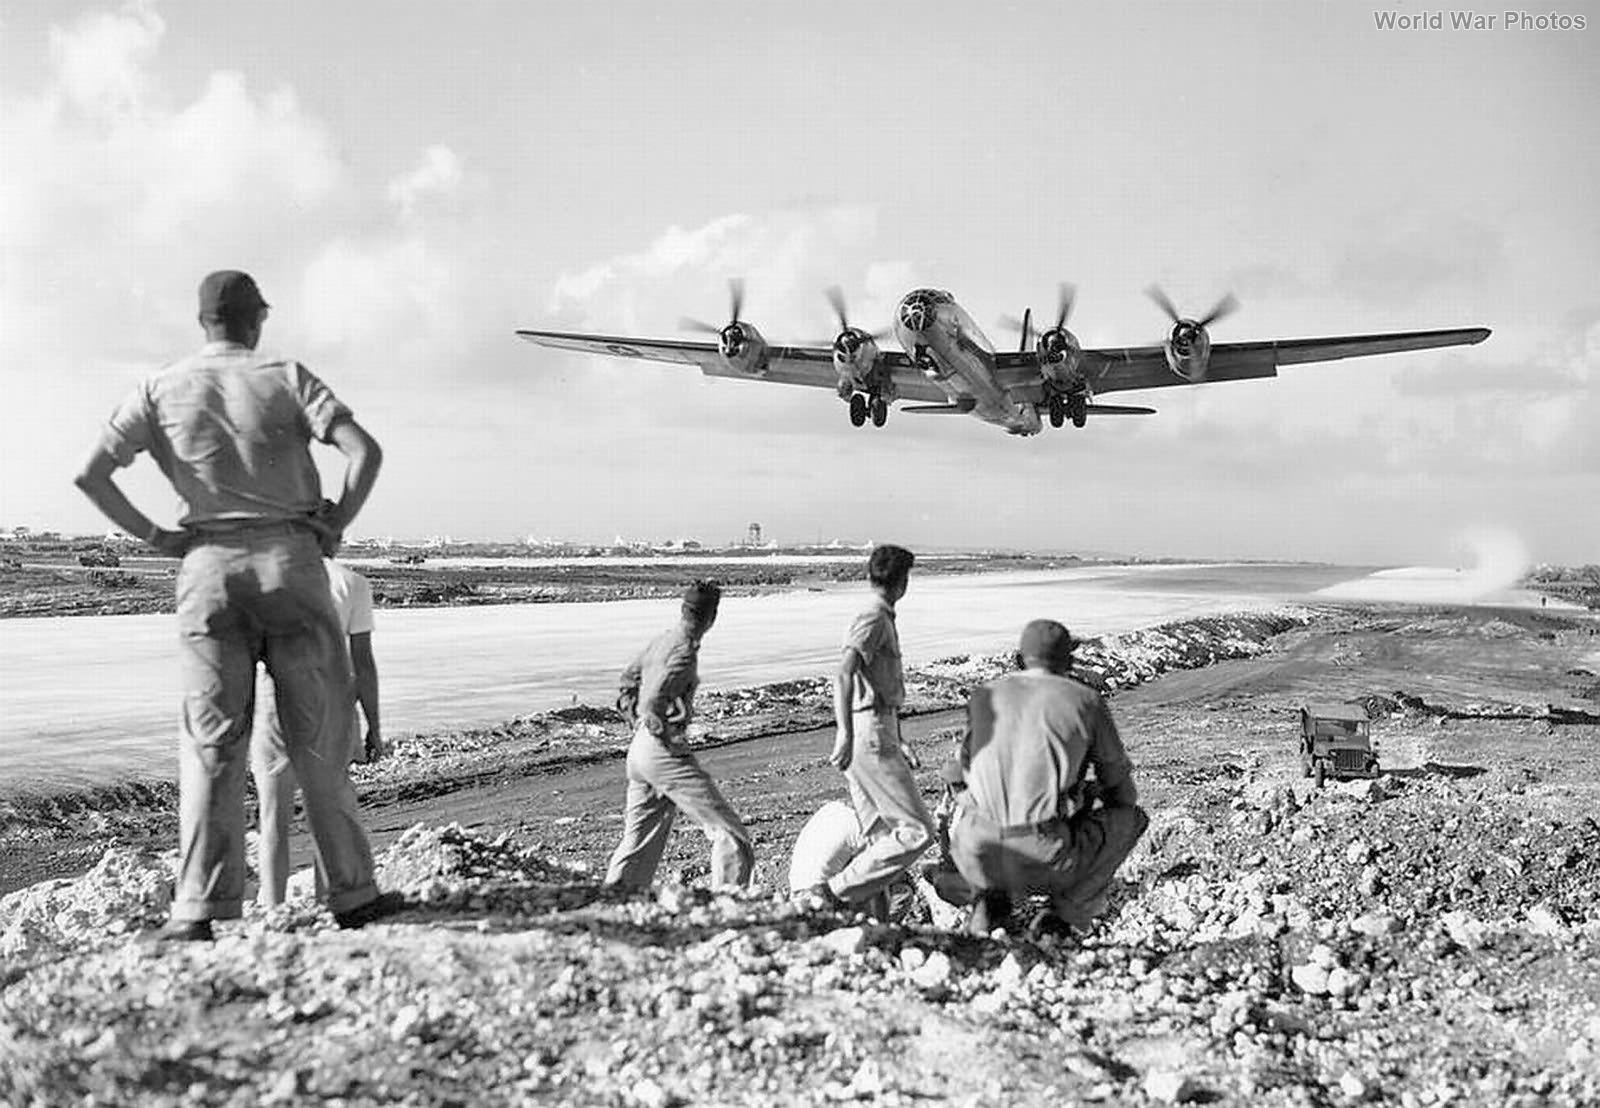 B-29 take off